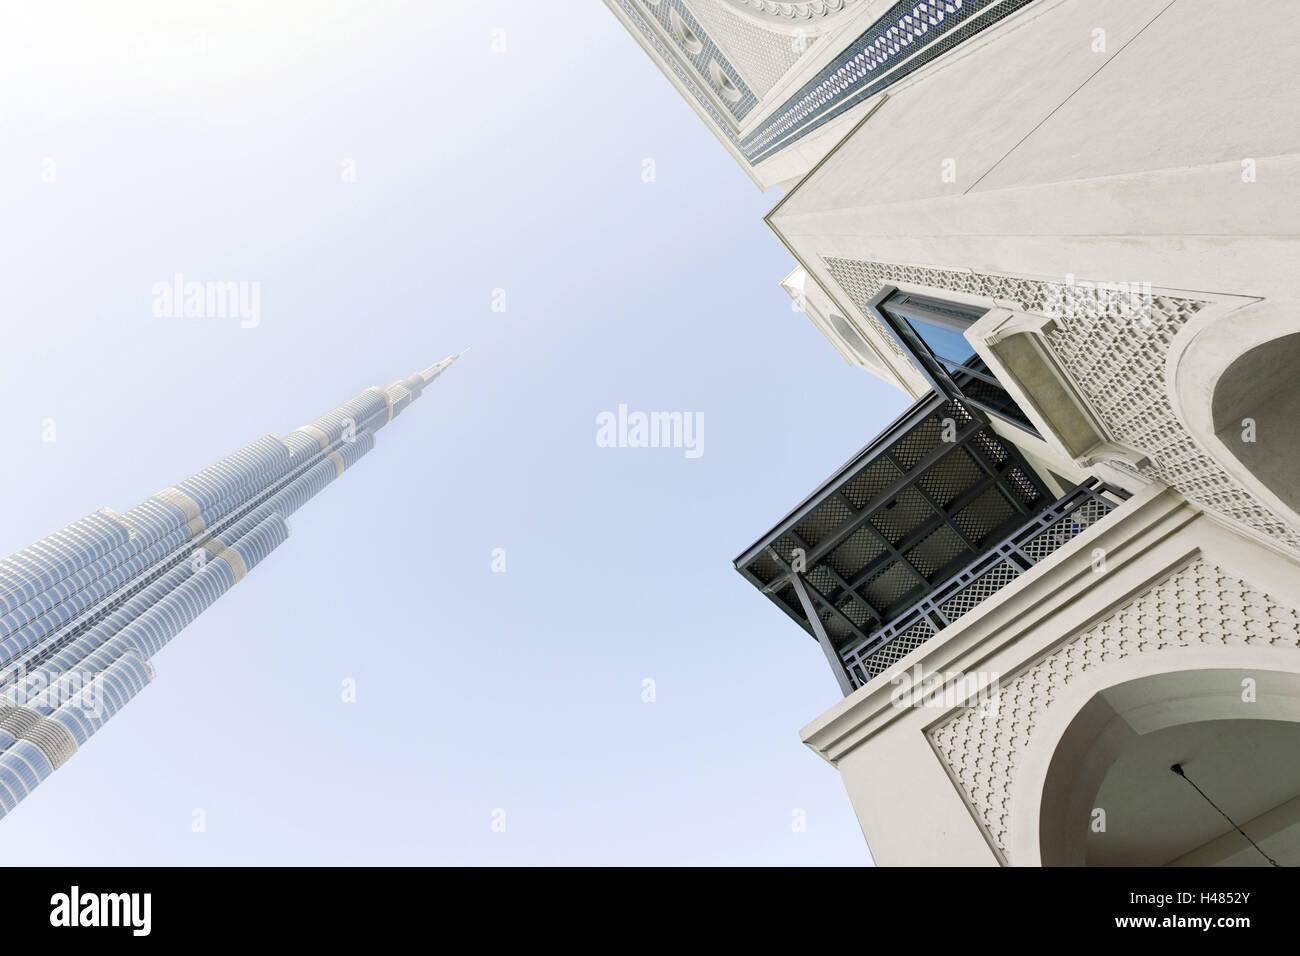 Burj Khalifa and Souk Al Bahar, Downtown Dubai, Dubai, United Arab Emirates, the Middle East - Stock Image